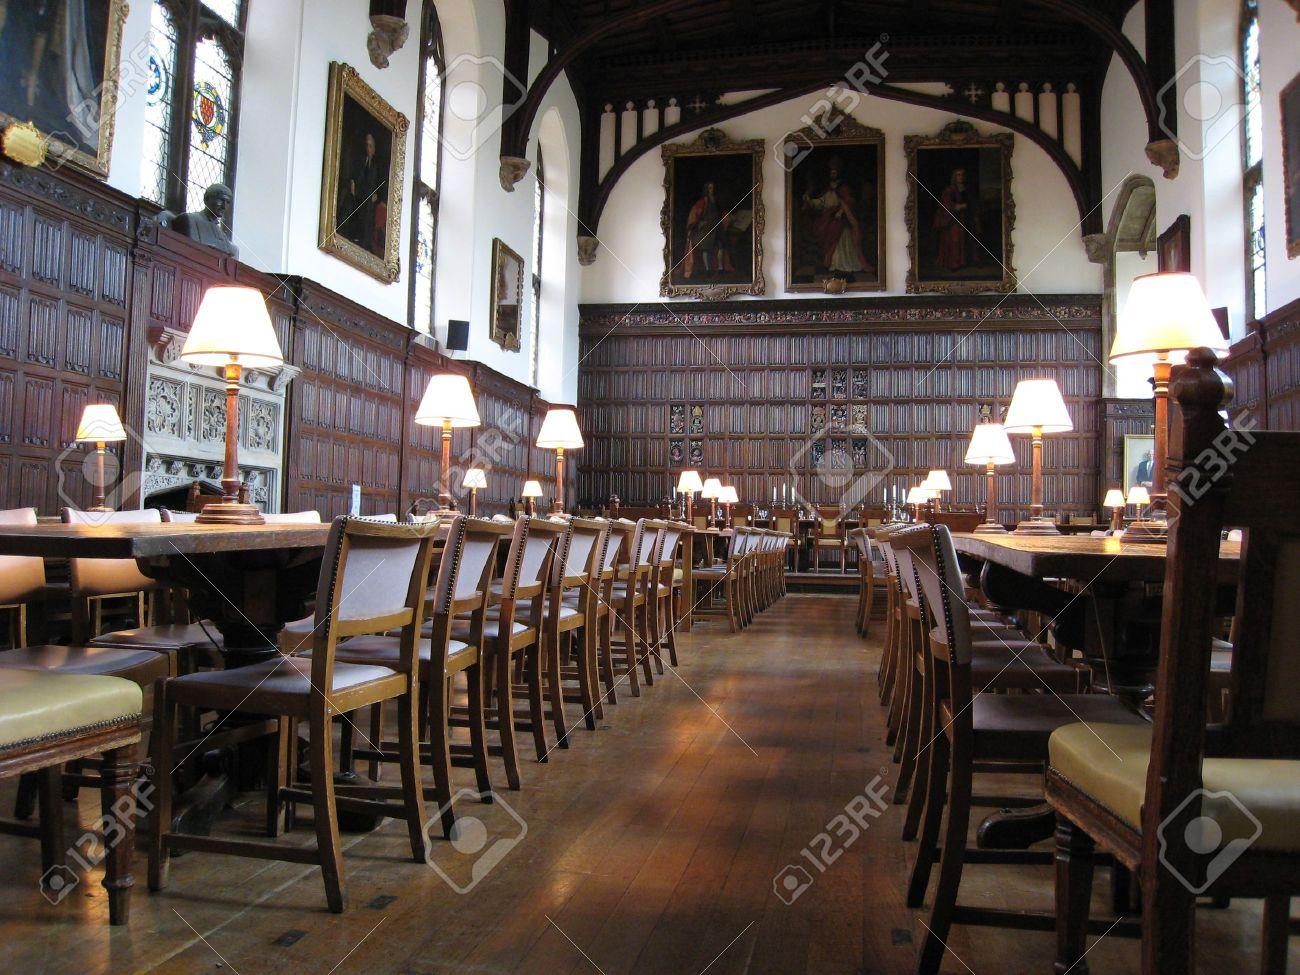 Oxford University England July 2009